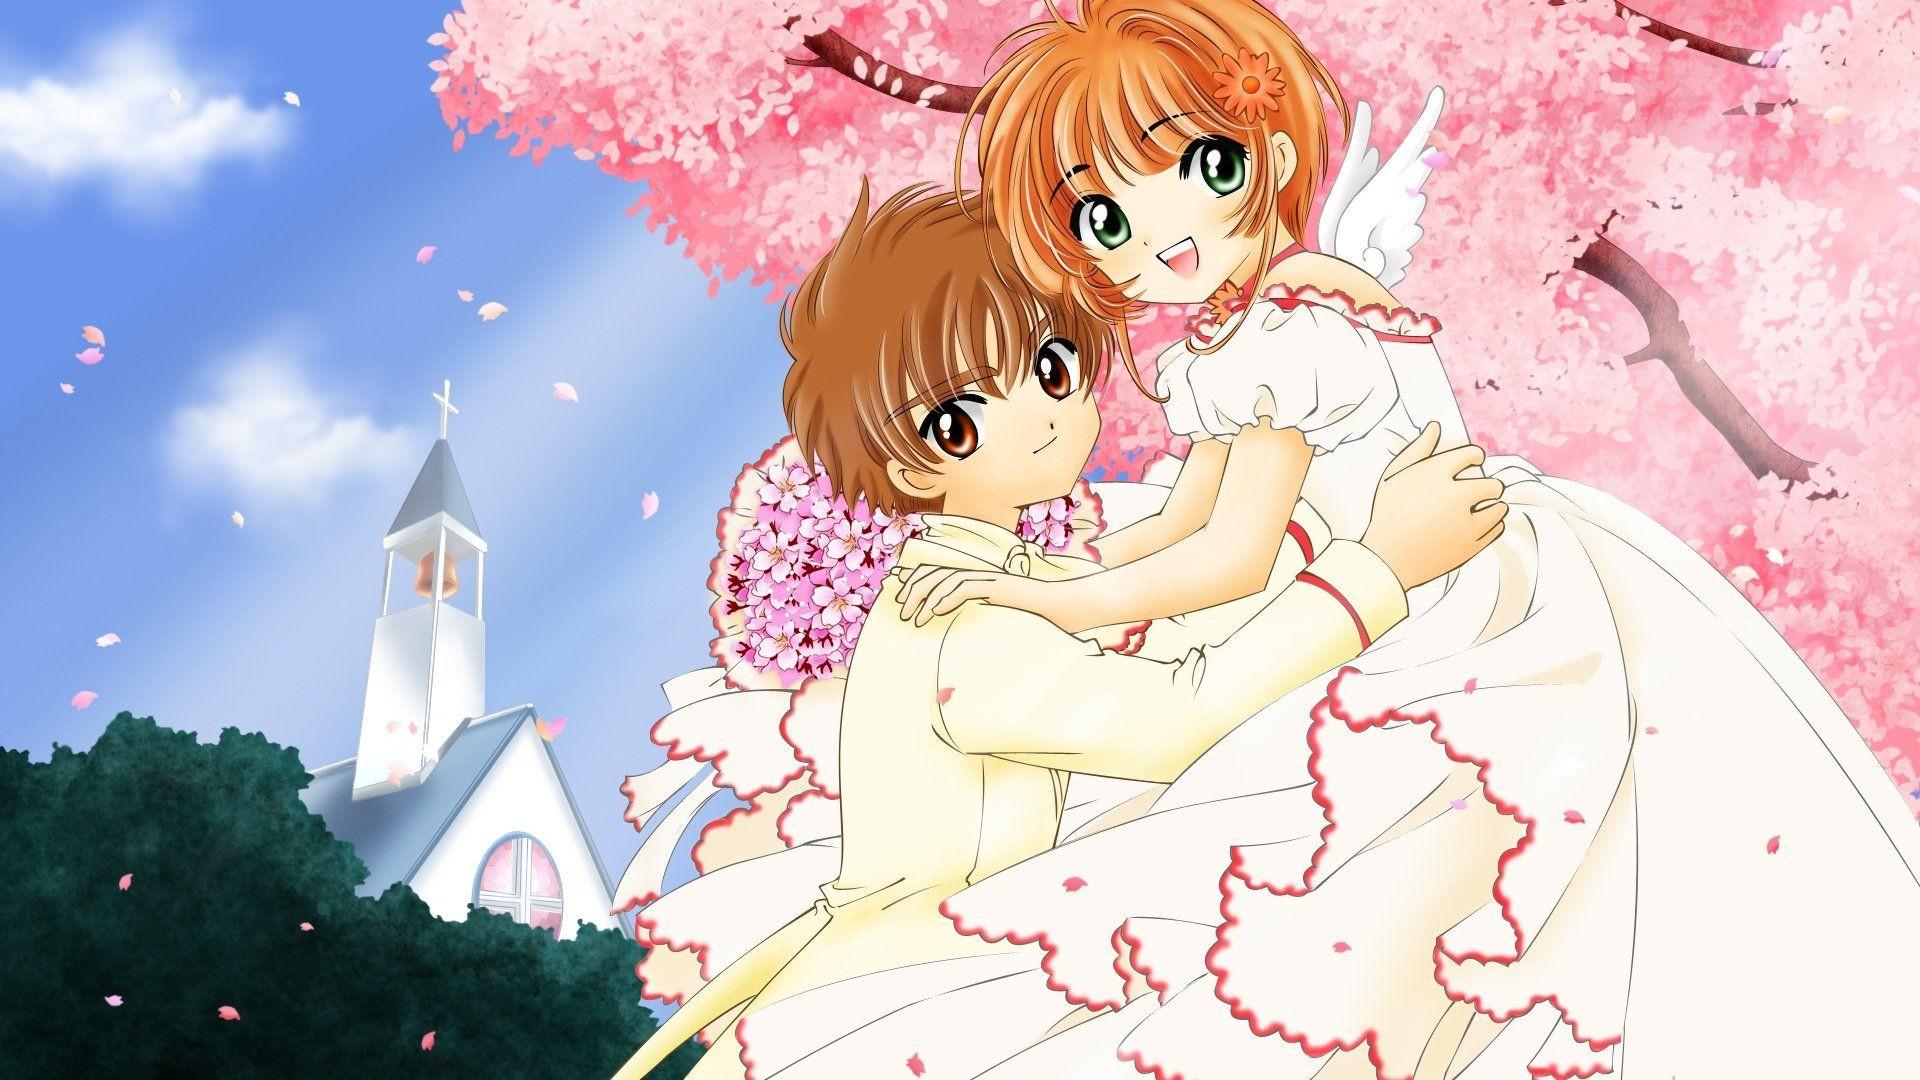 Res: 1920x1080, Zerochan anime image gallery for Cardcaptor Sakura, Wallpaper.